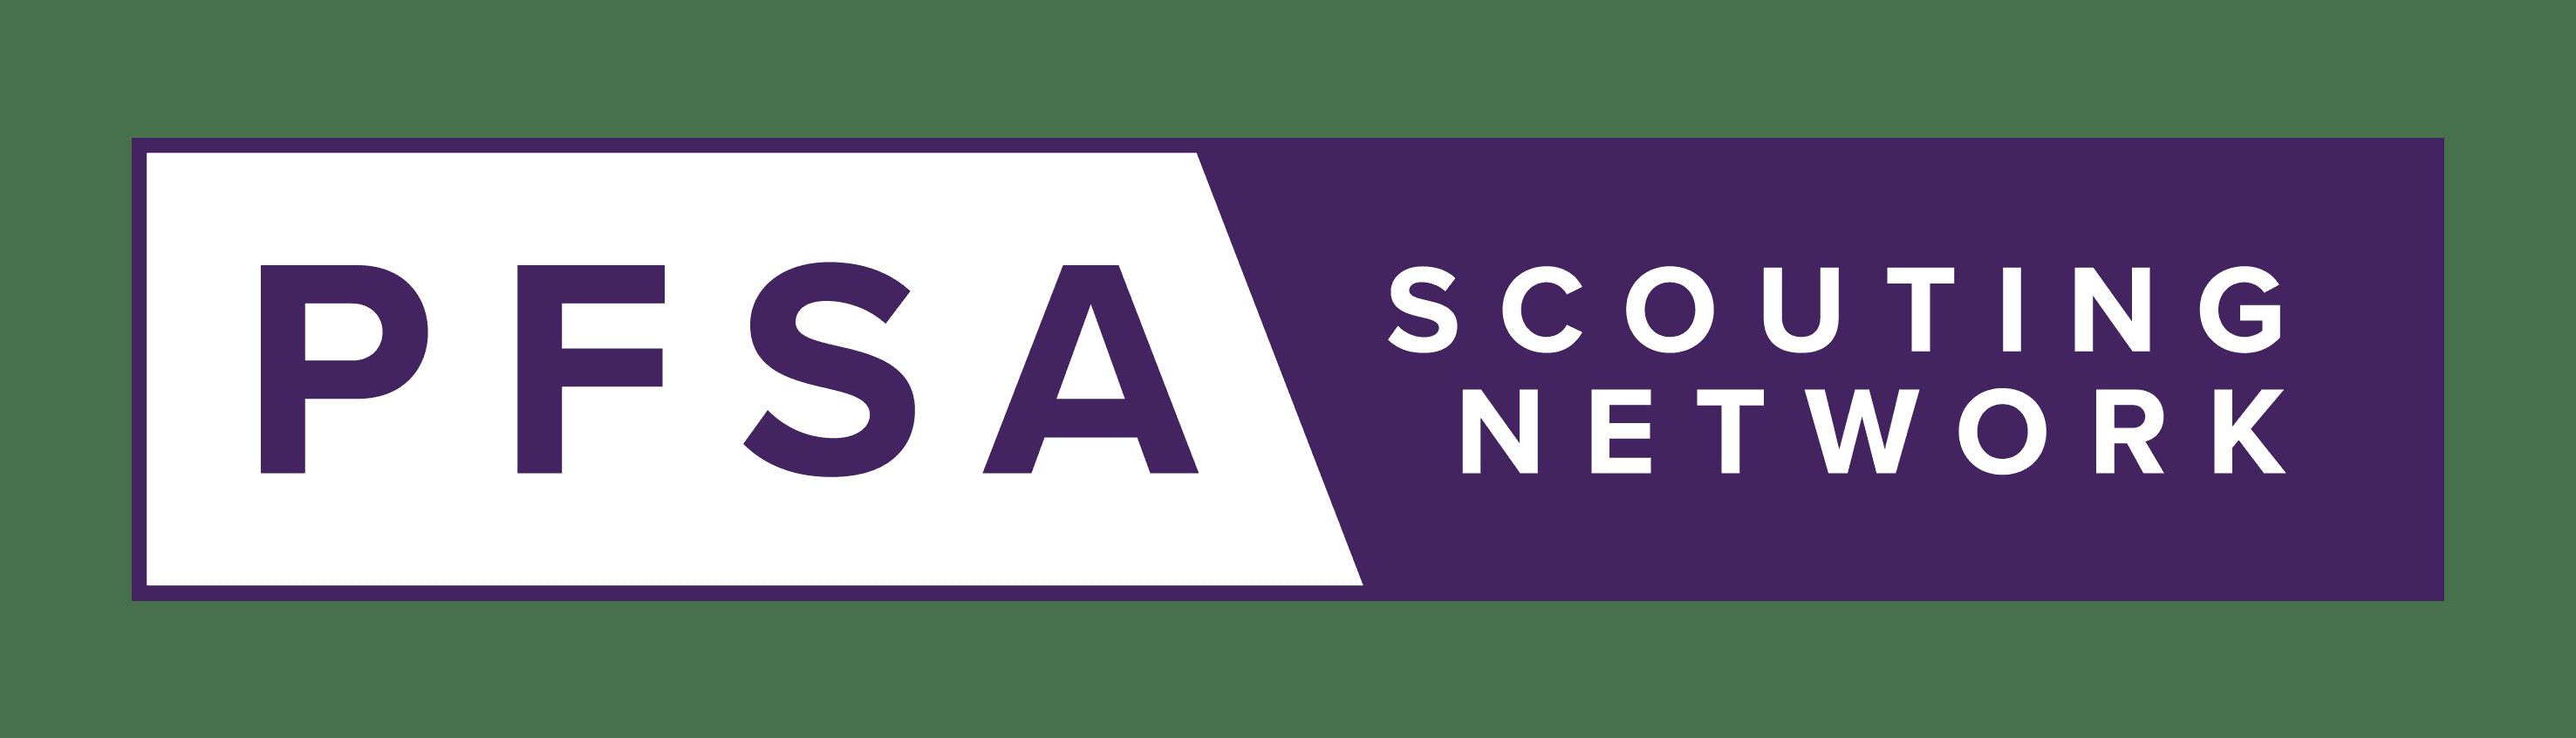 PFSA Scouting Network